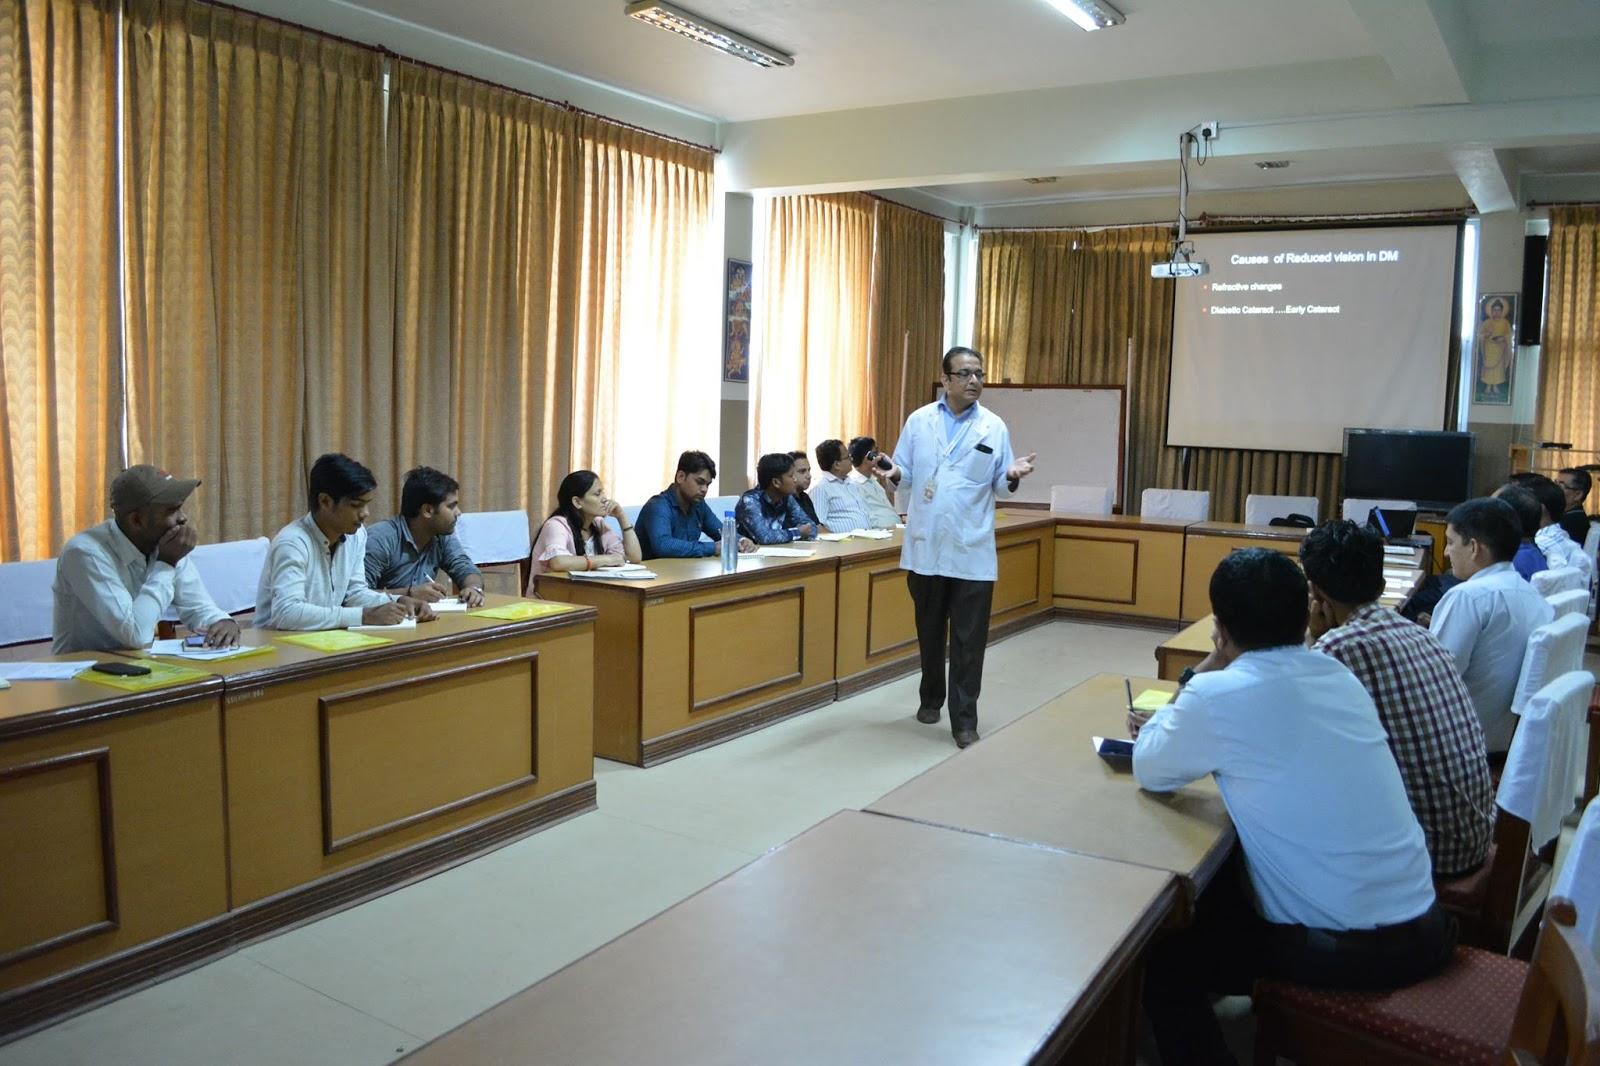 Dr Gyanendra Lamichhane